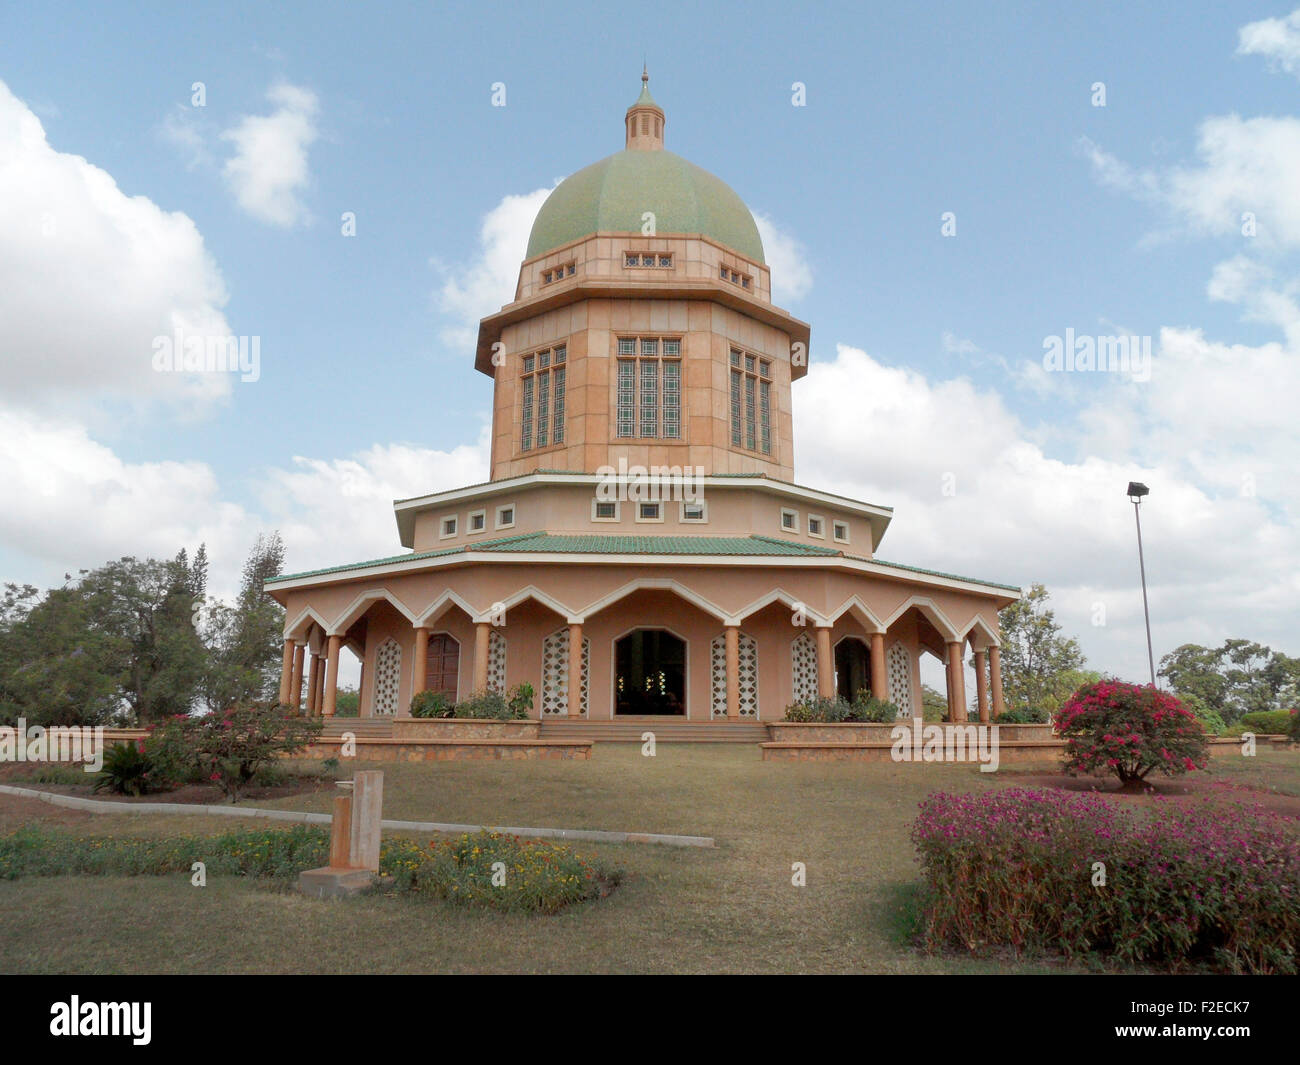 Moschee, Kampala, Februar 2011, Uganda. Imagen De Stock